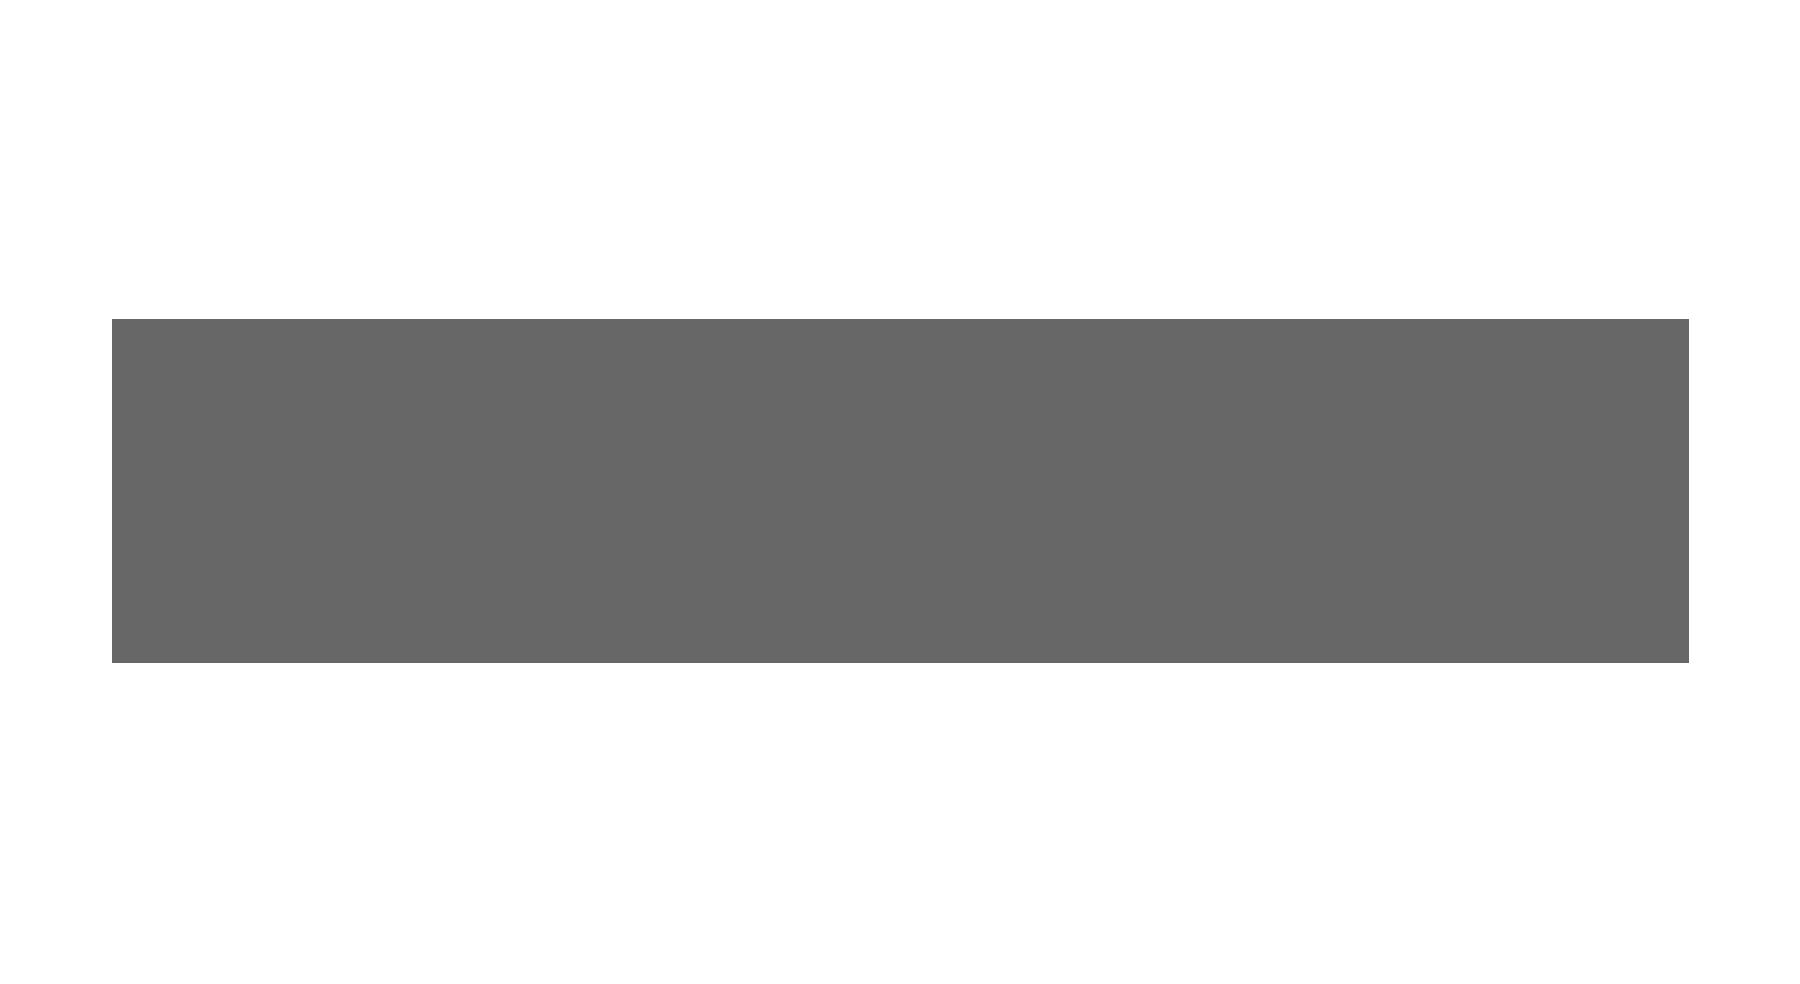 Balancefestival